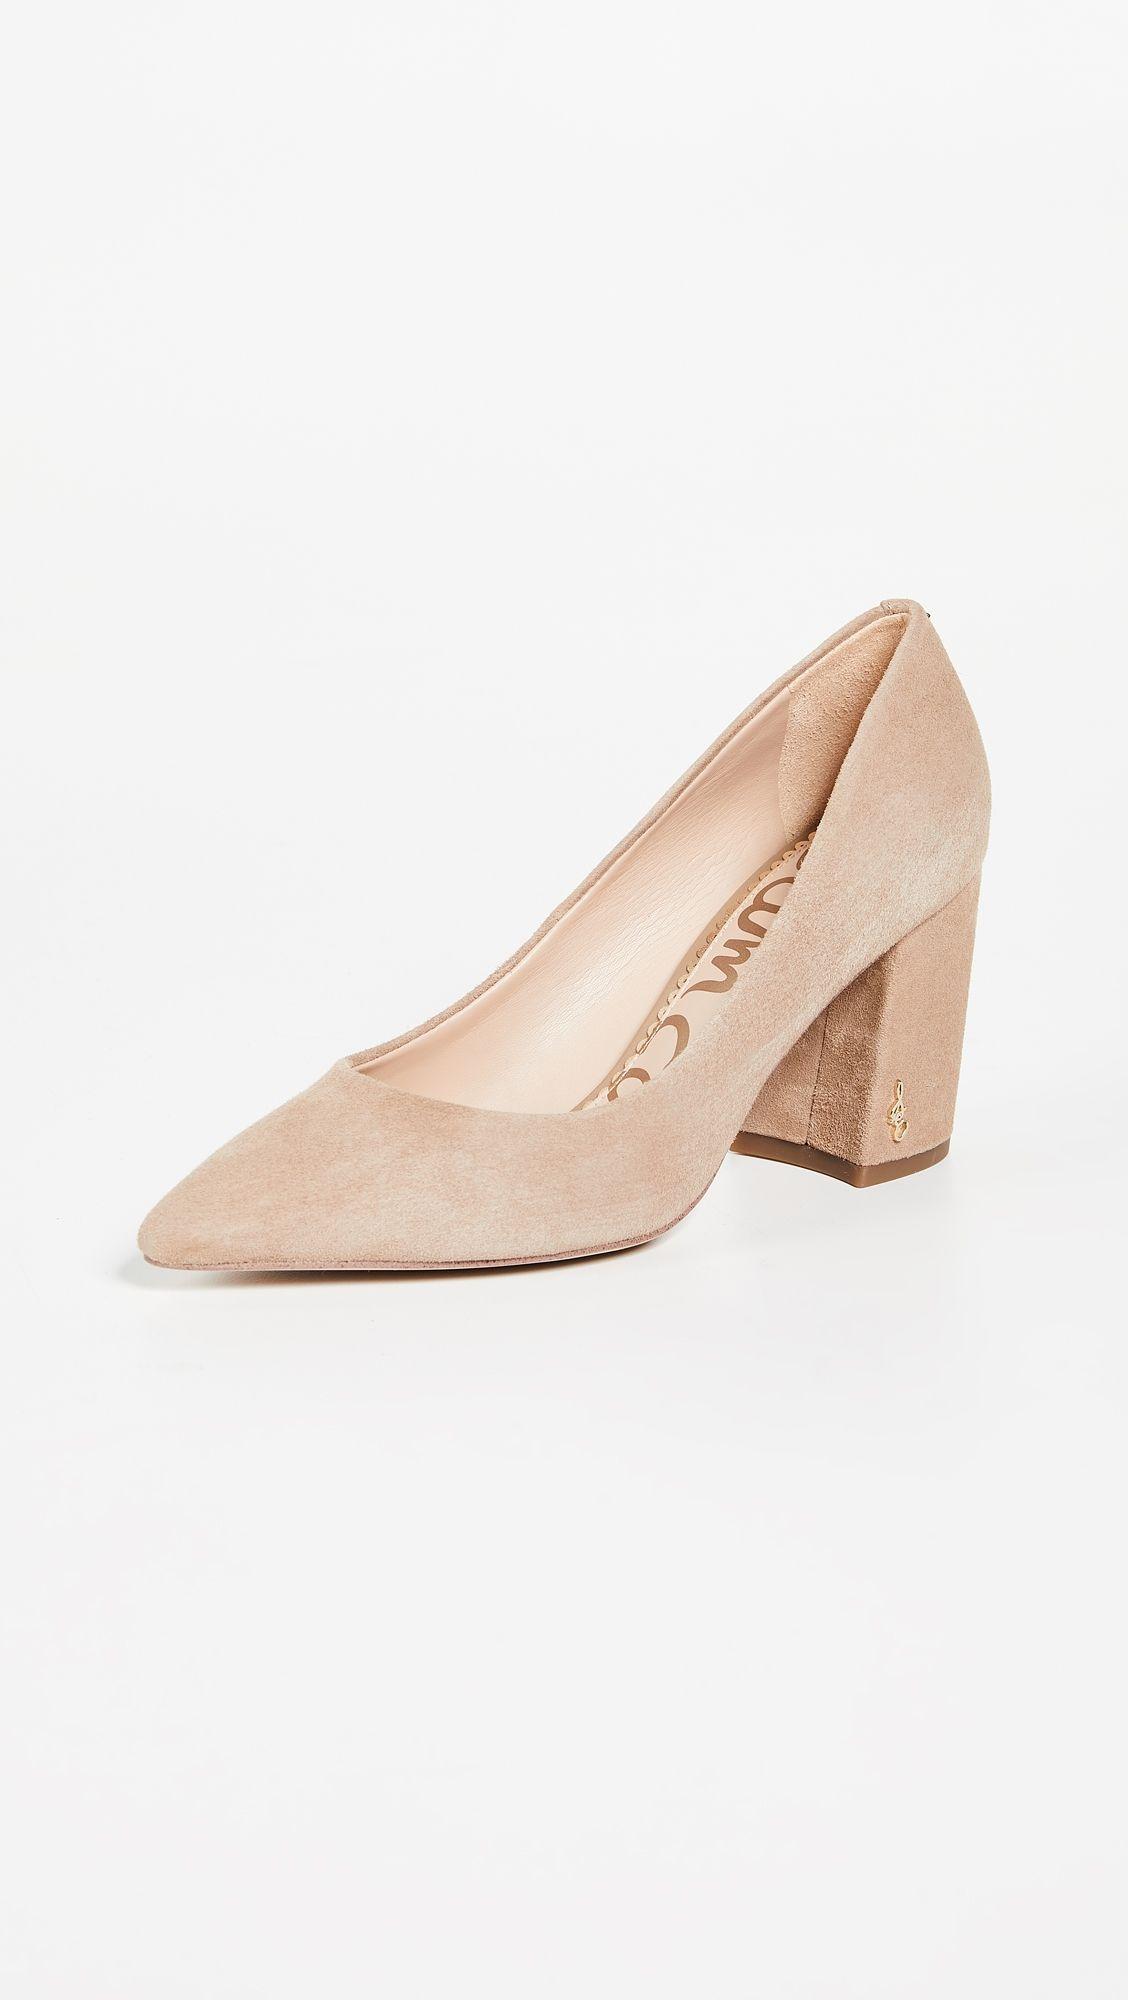 5dd3fe9aa0 Sam Edelman Tatiana Pumps in 2019 | Products | Pumps, Chunky heel ...